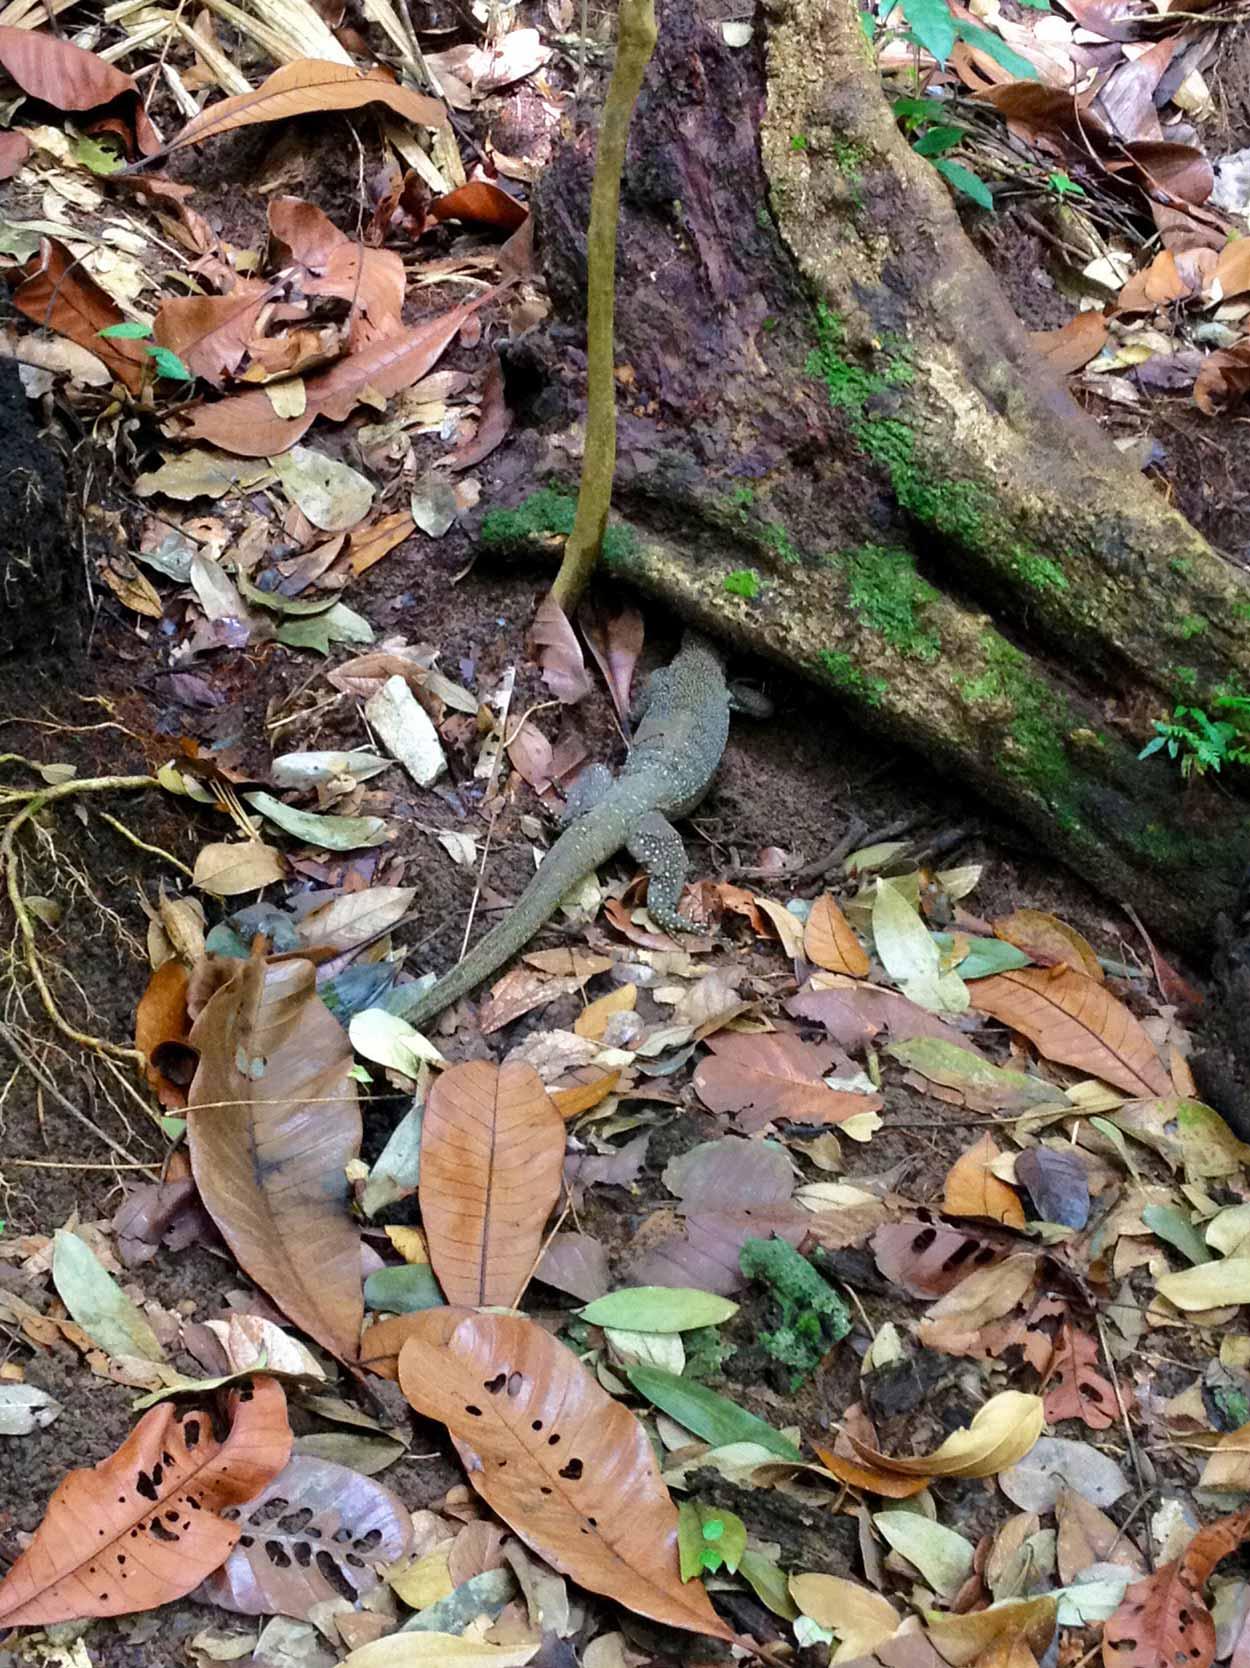 A hiding lizard, Bukit Timah, Singapore